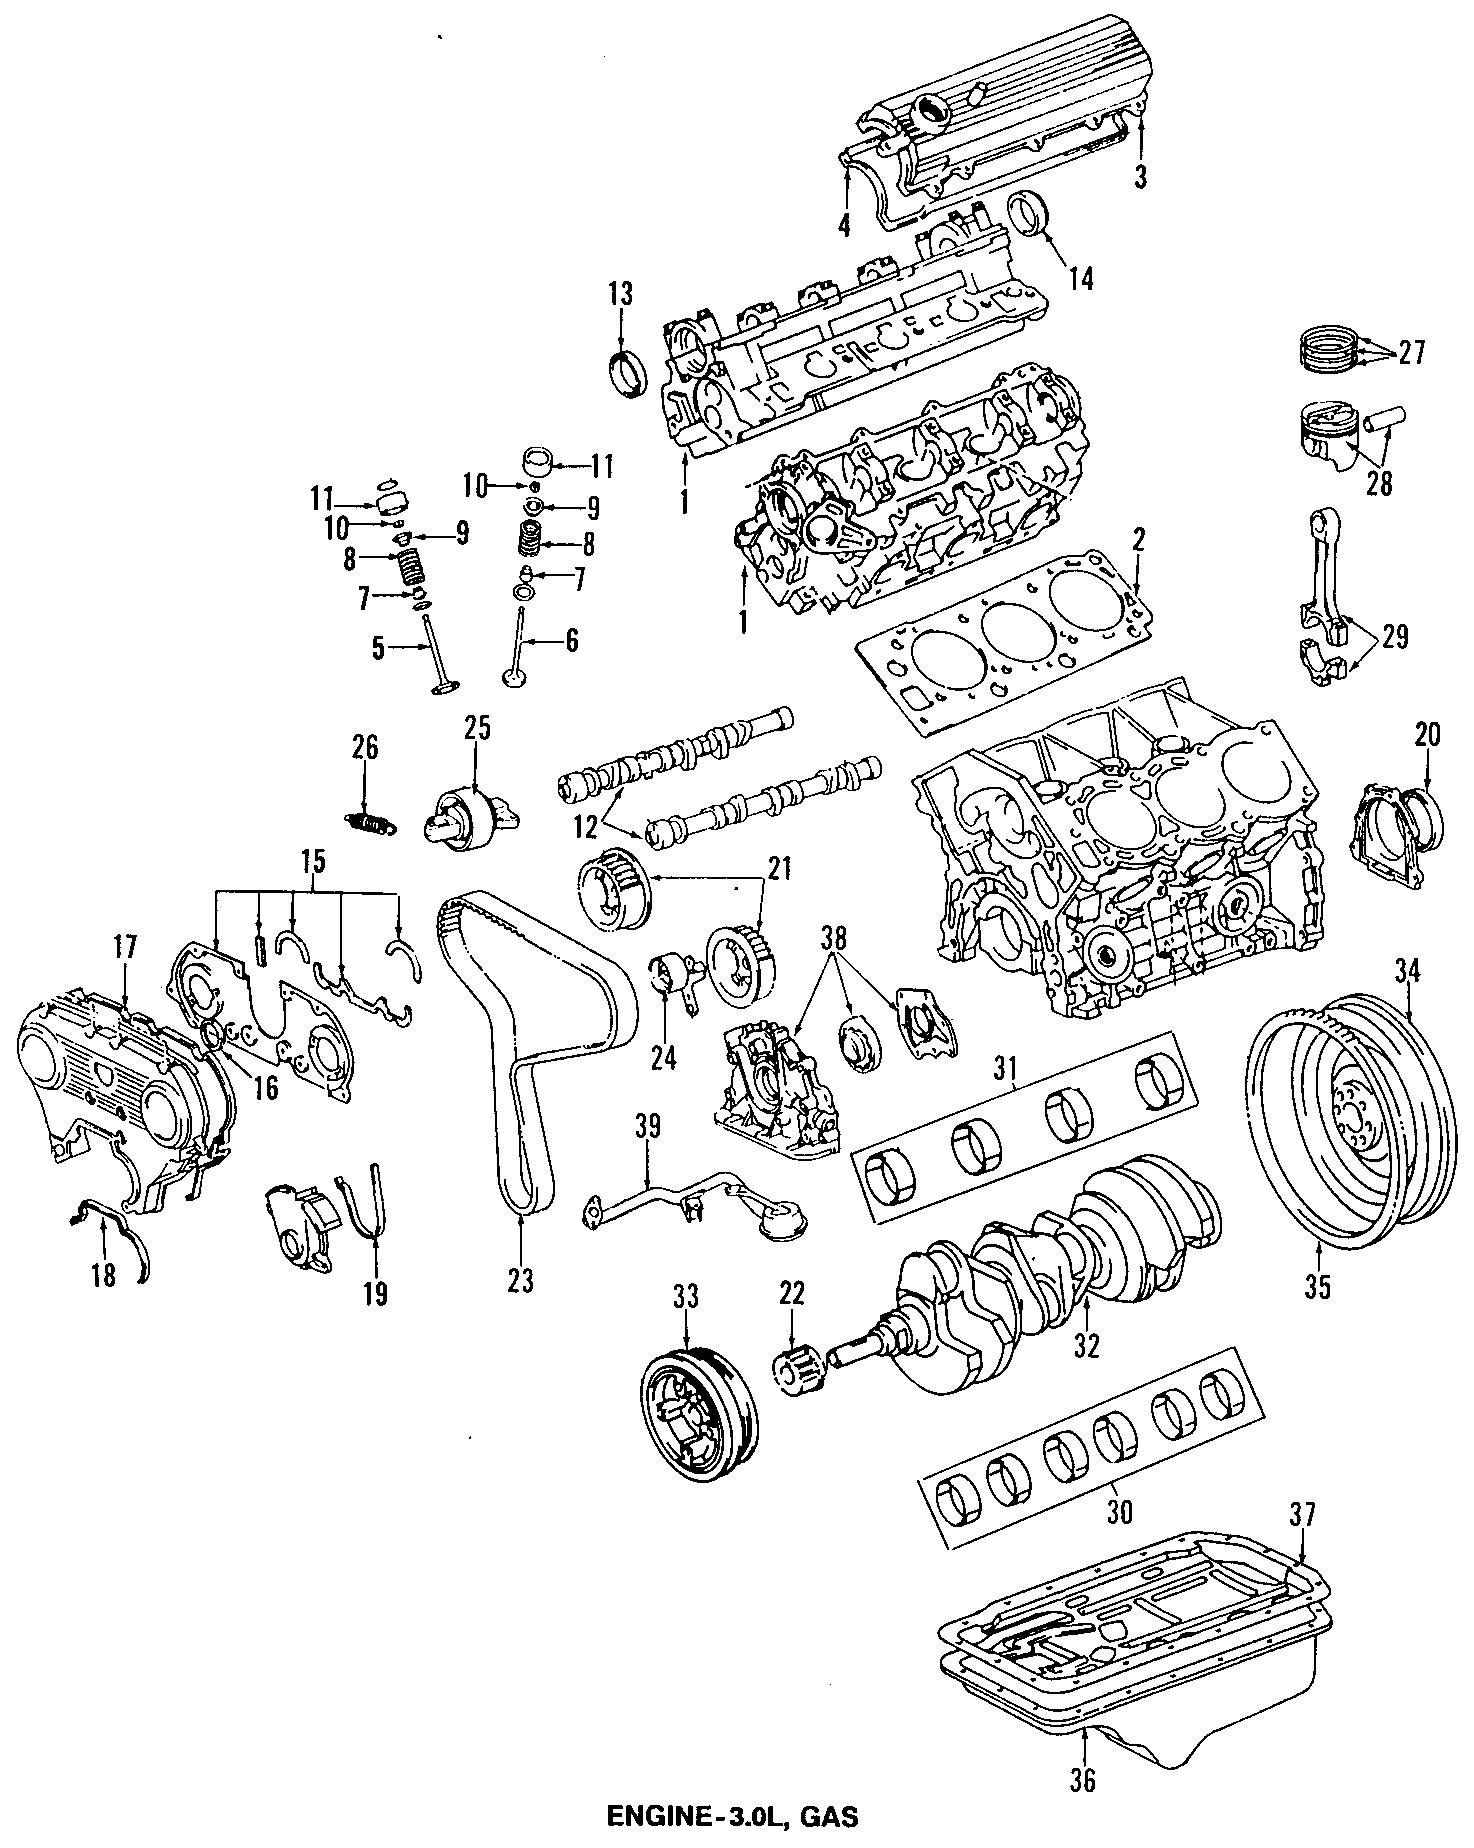 Toyota PickUp Lock, valve spring r. Retainer, spring